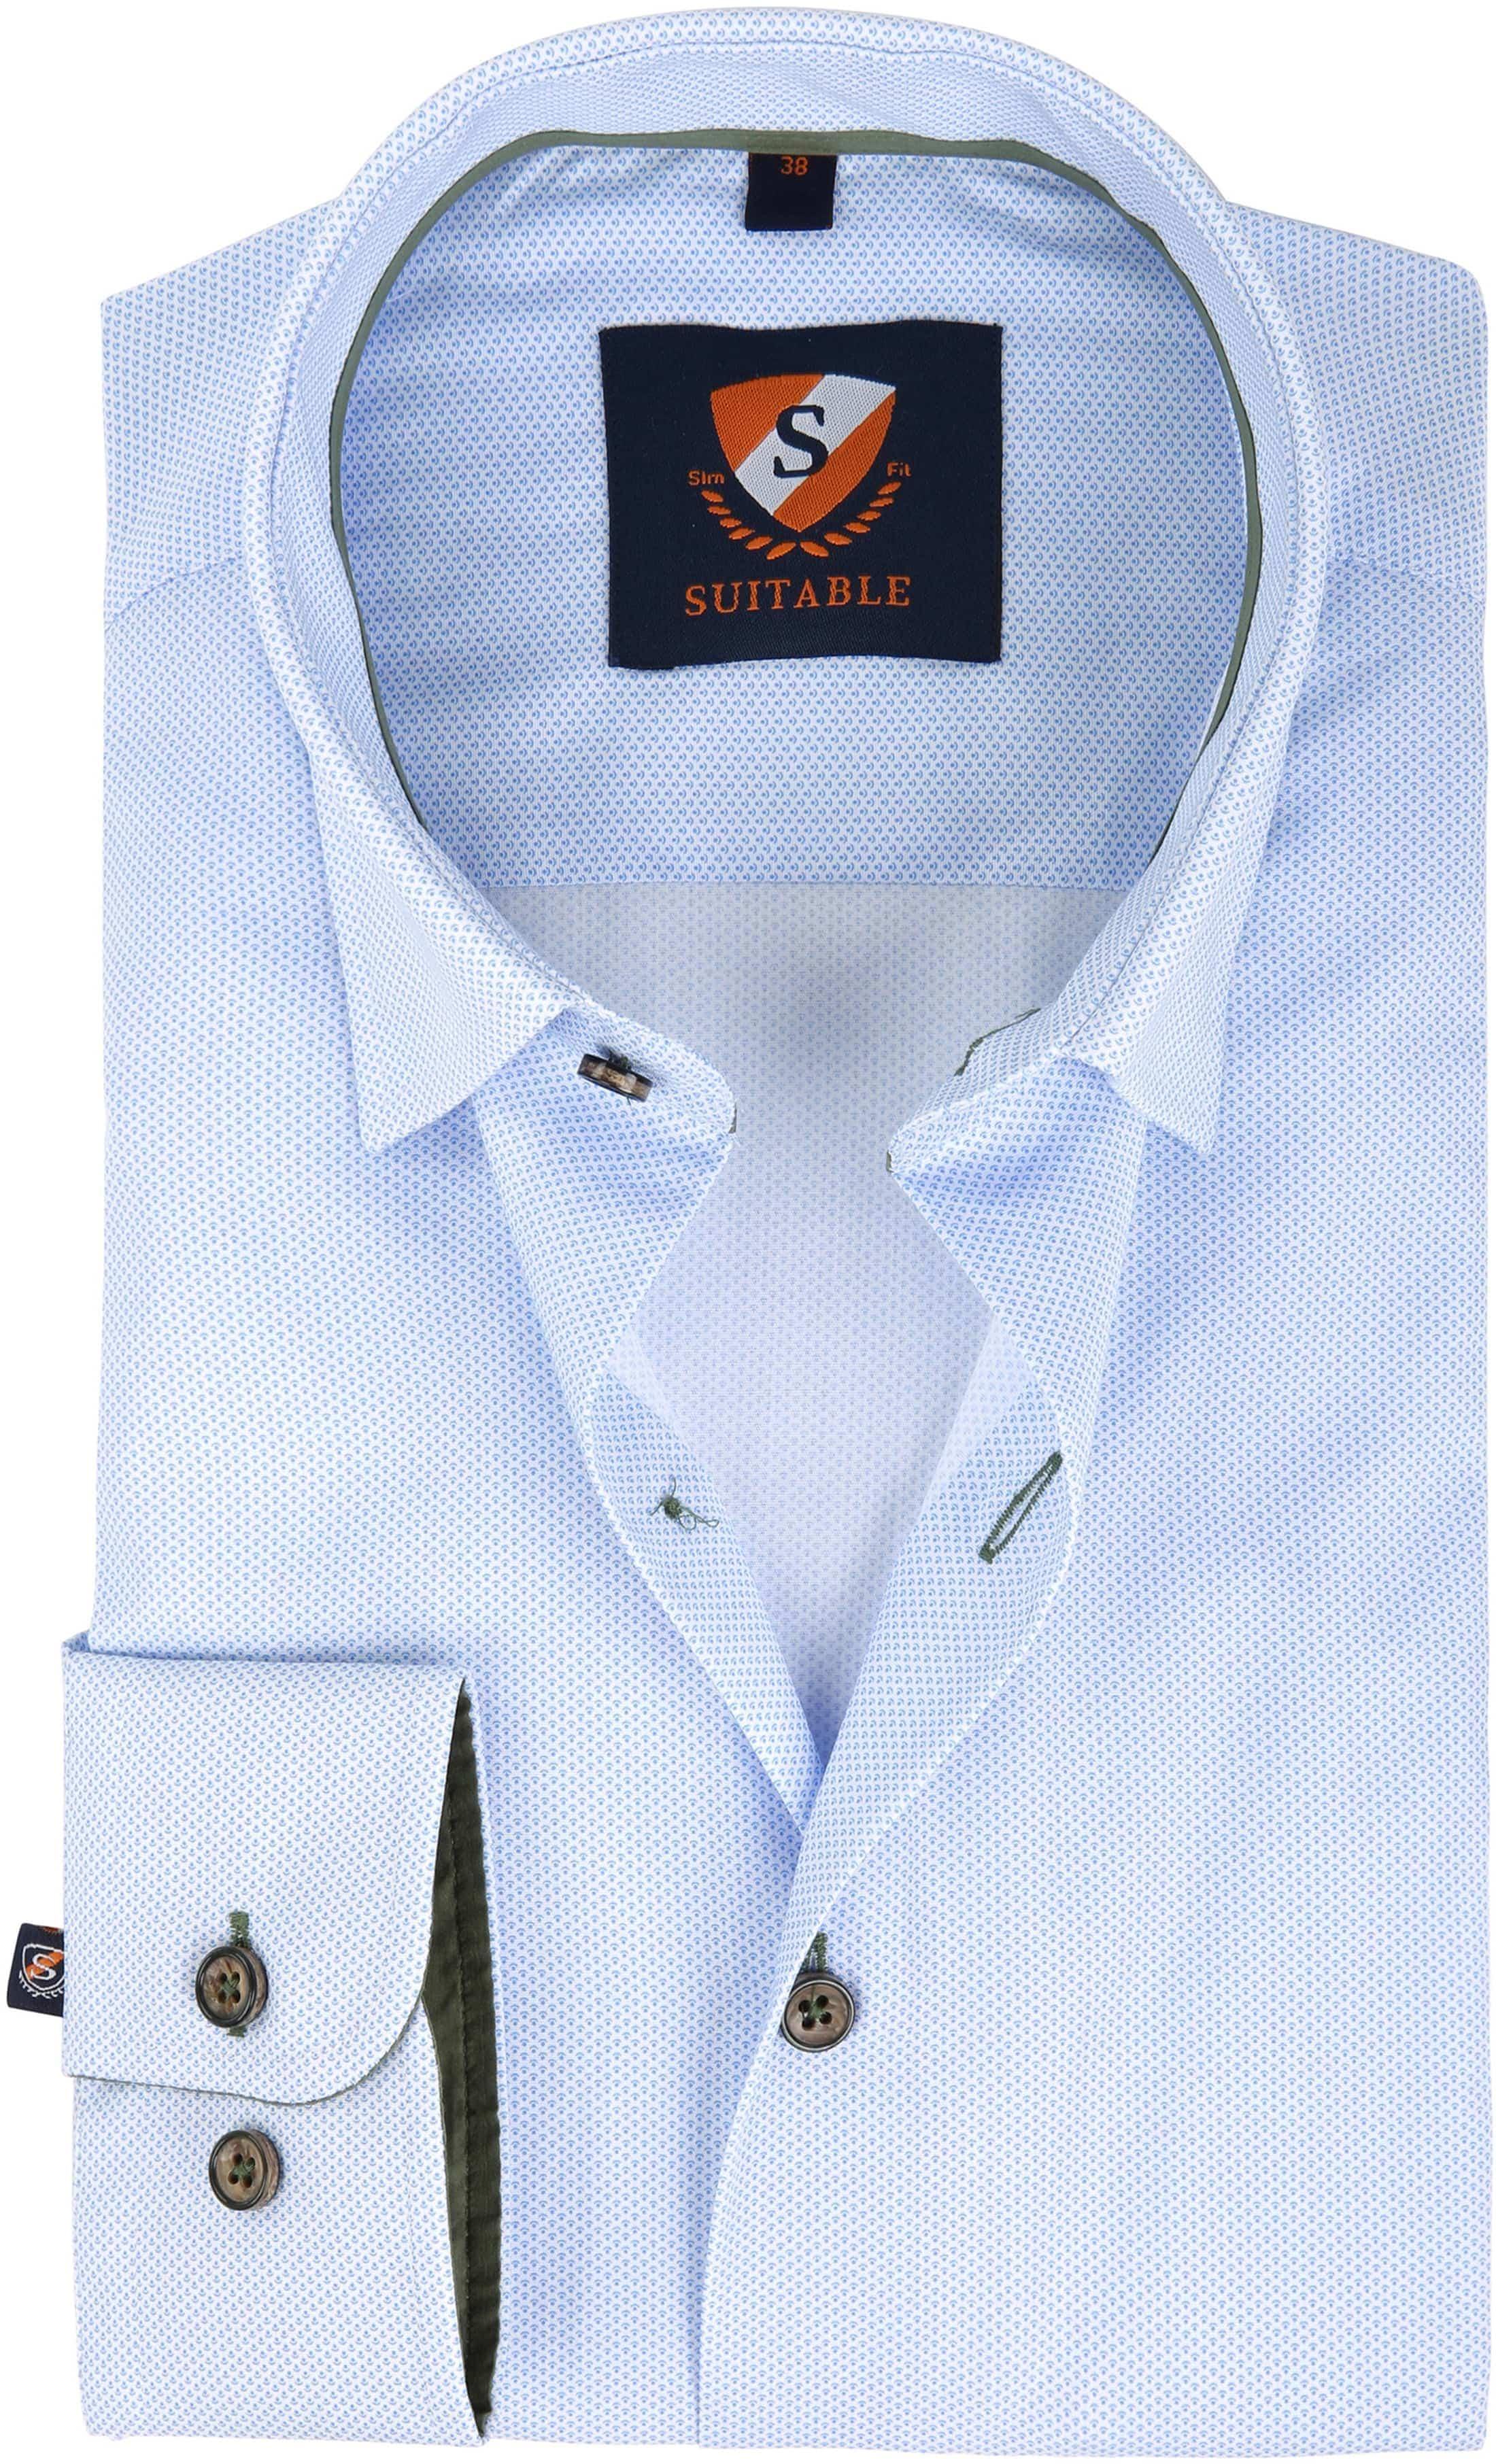 Overhemd Blauw.Suitable Overhemd Blauw Dessin 183 2 Hbd Beauty Blue Online